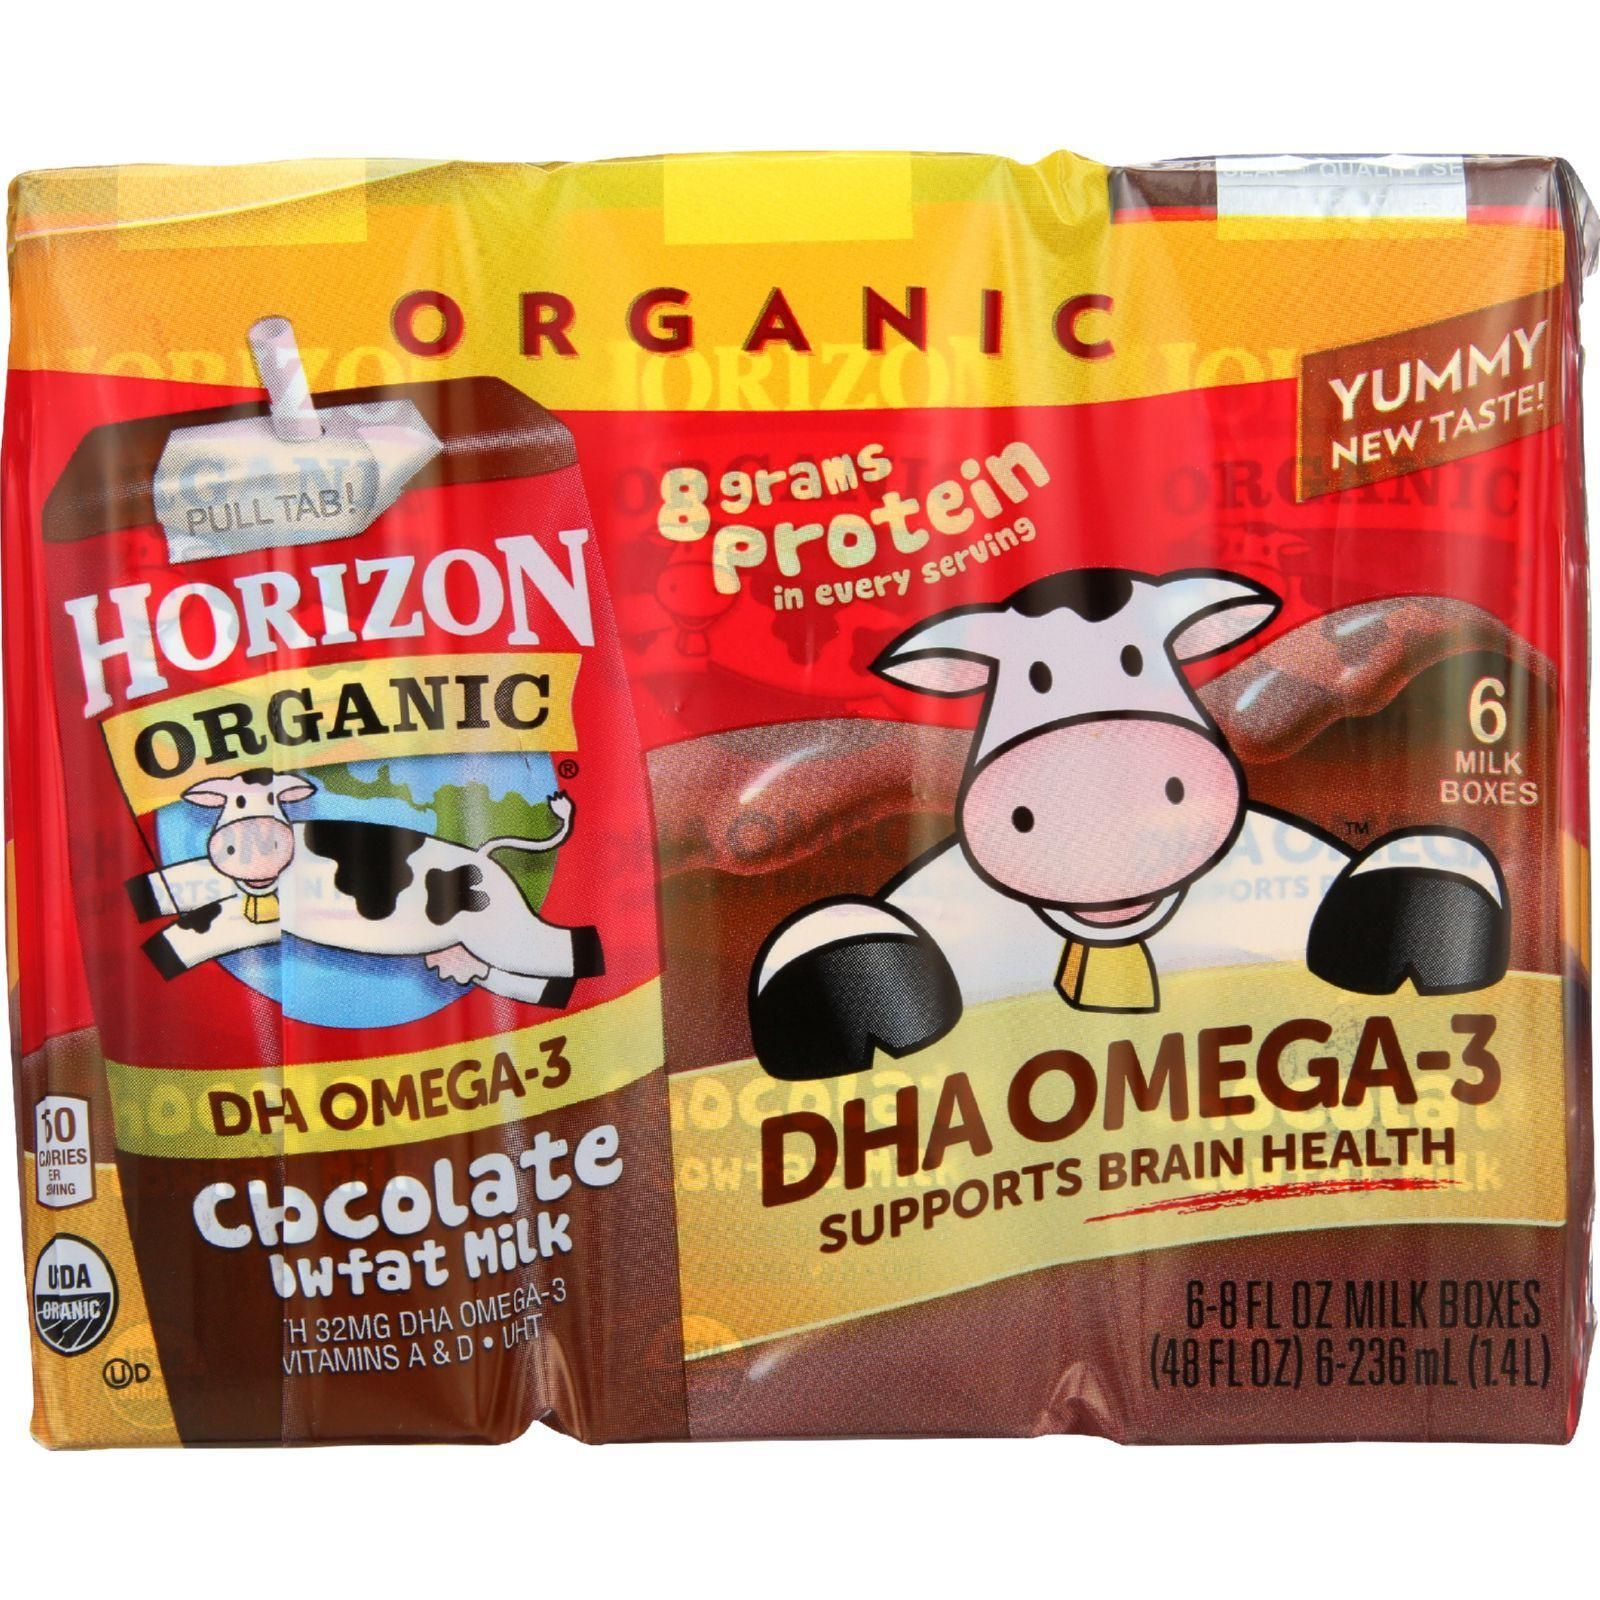 Horizon organic dairy milk organic 1 percent lowfat